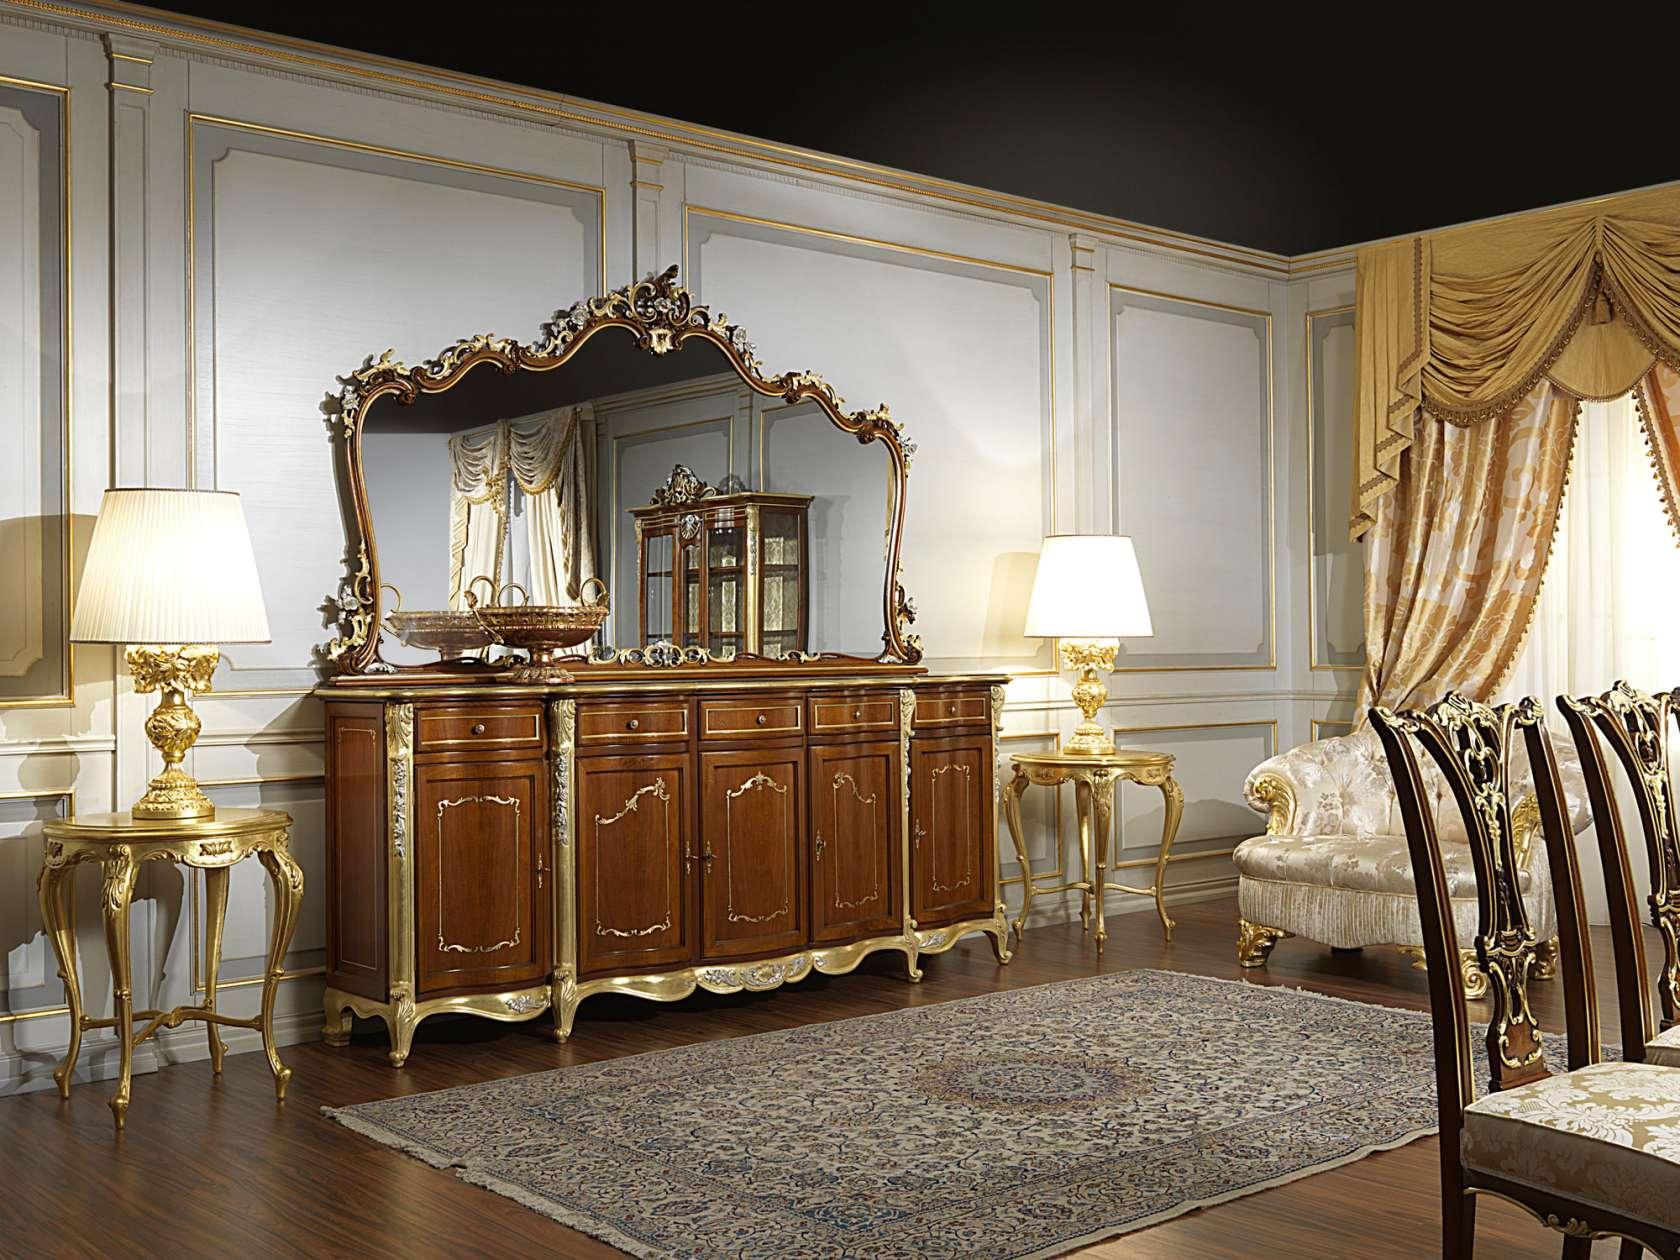 Credenza Camera Da Pranzo : Credenza classica sala da pranzo in stile luigi xv vimercati meda